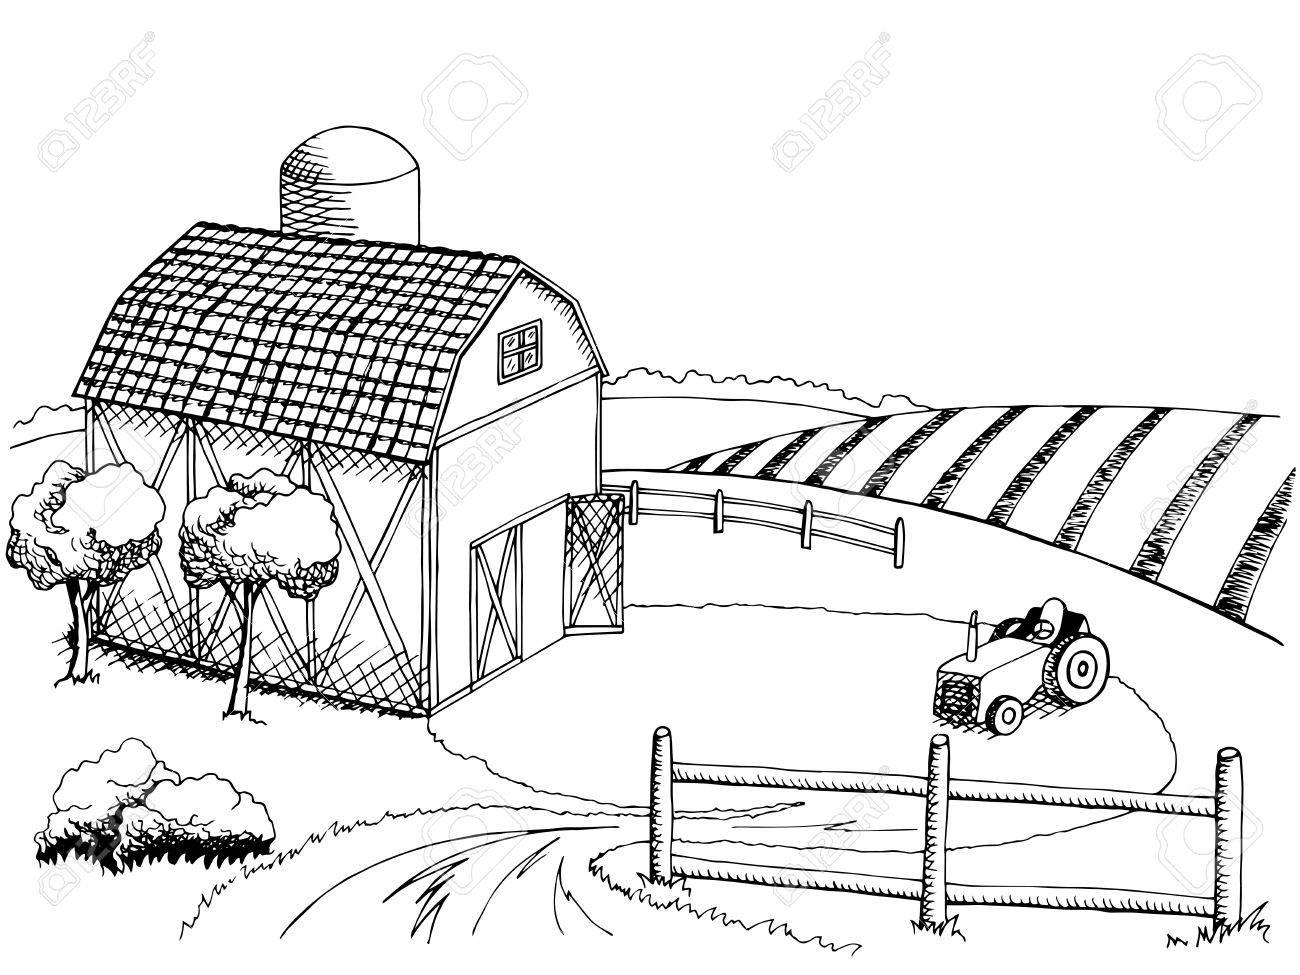 Farm field graphic art black white landscape illustration vector.